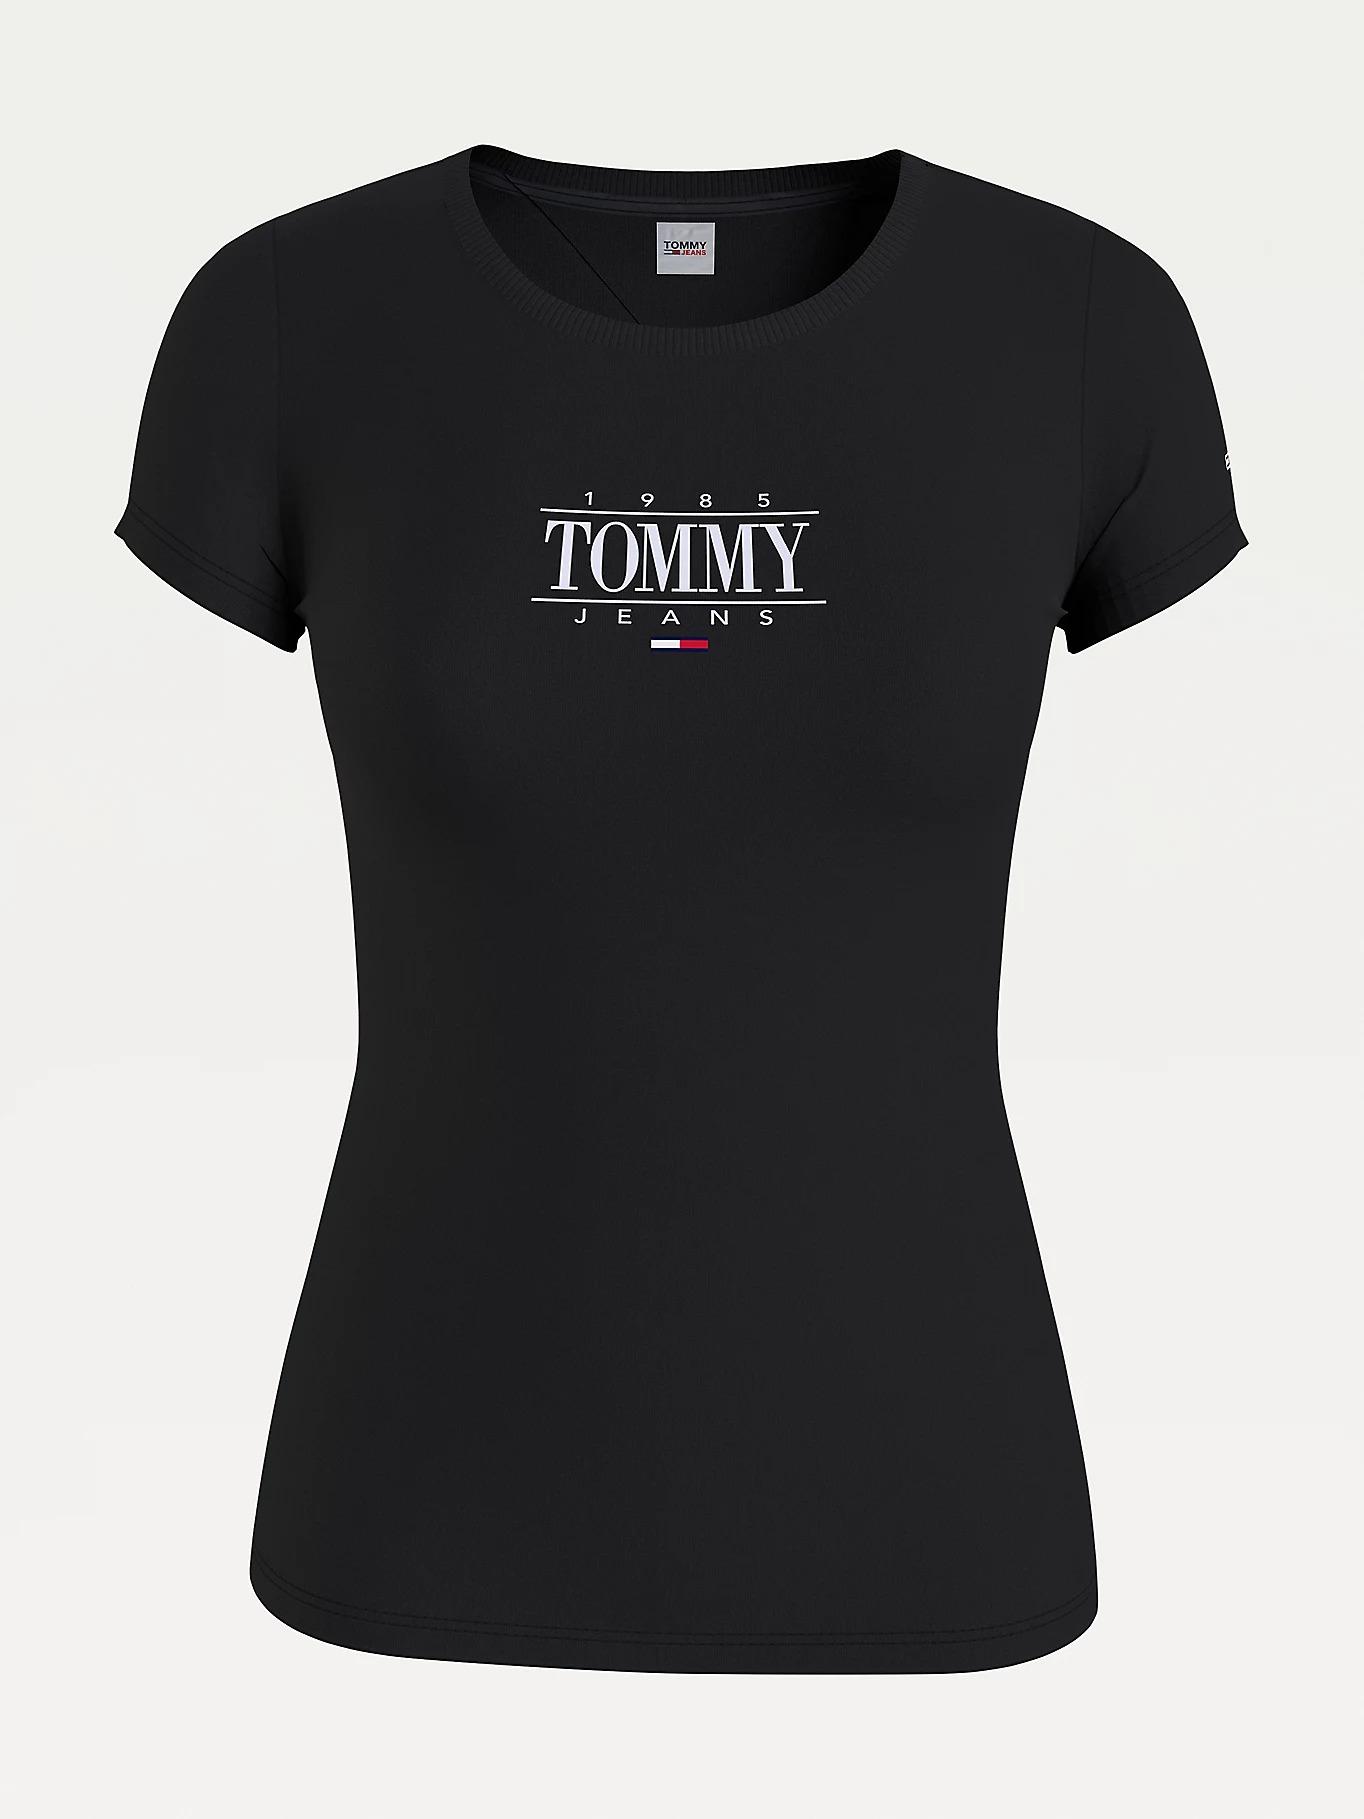 T-SHIRT ESSENTIAL SKINNY FIT CON LOGO TOMMY JEANS | T-shirt | DW0DW11239BDS BLACK